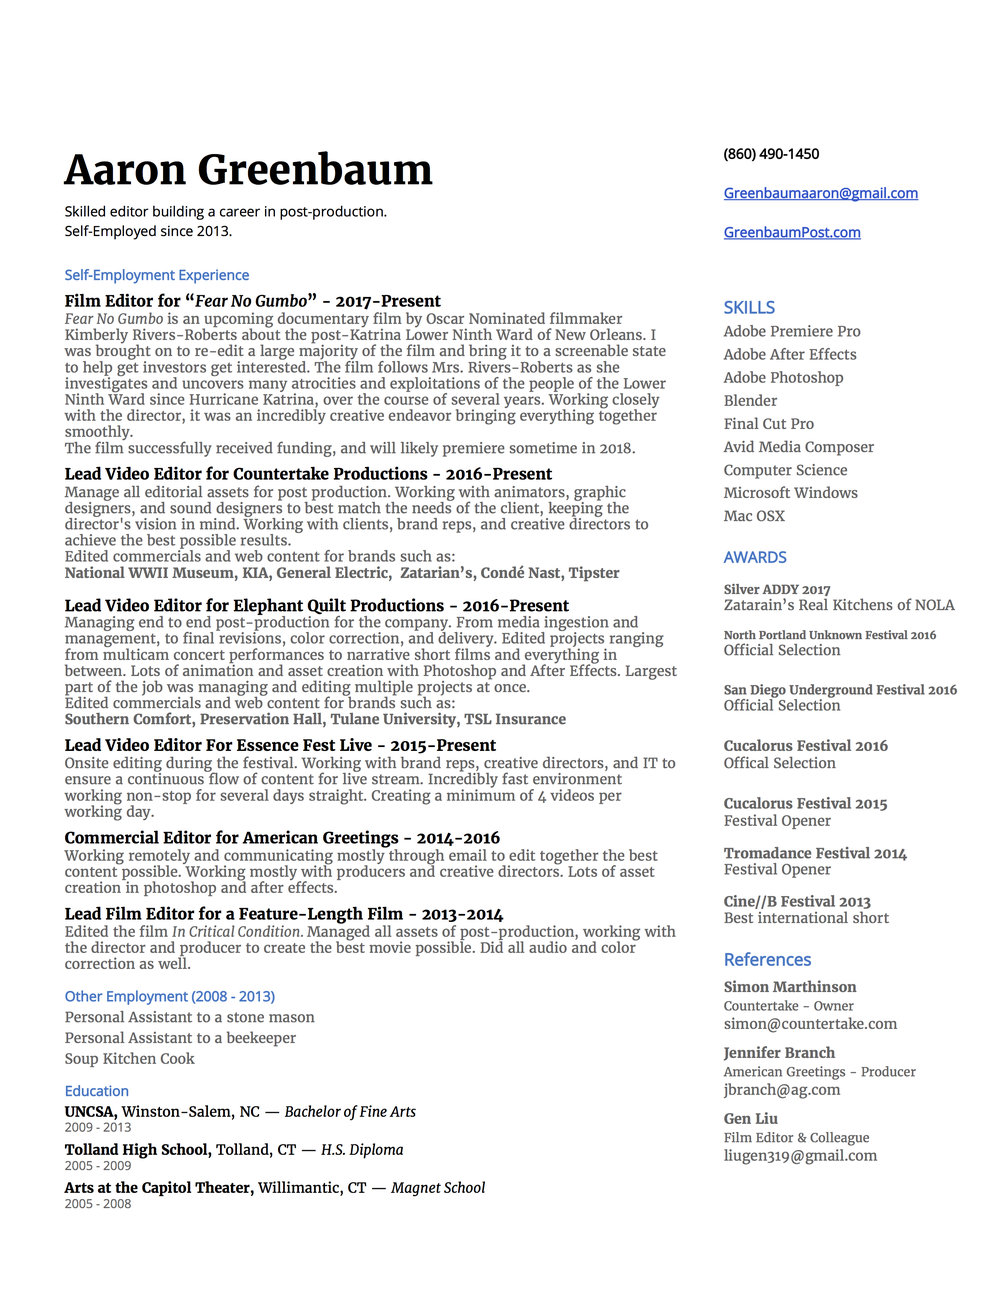 Aaron Greenbaum Resume 10_25_17.jpg